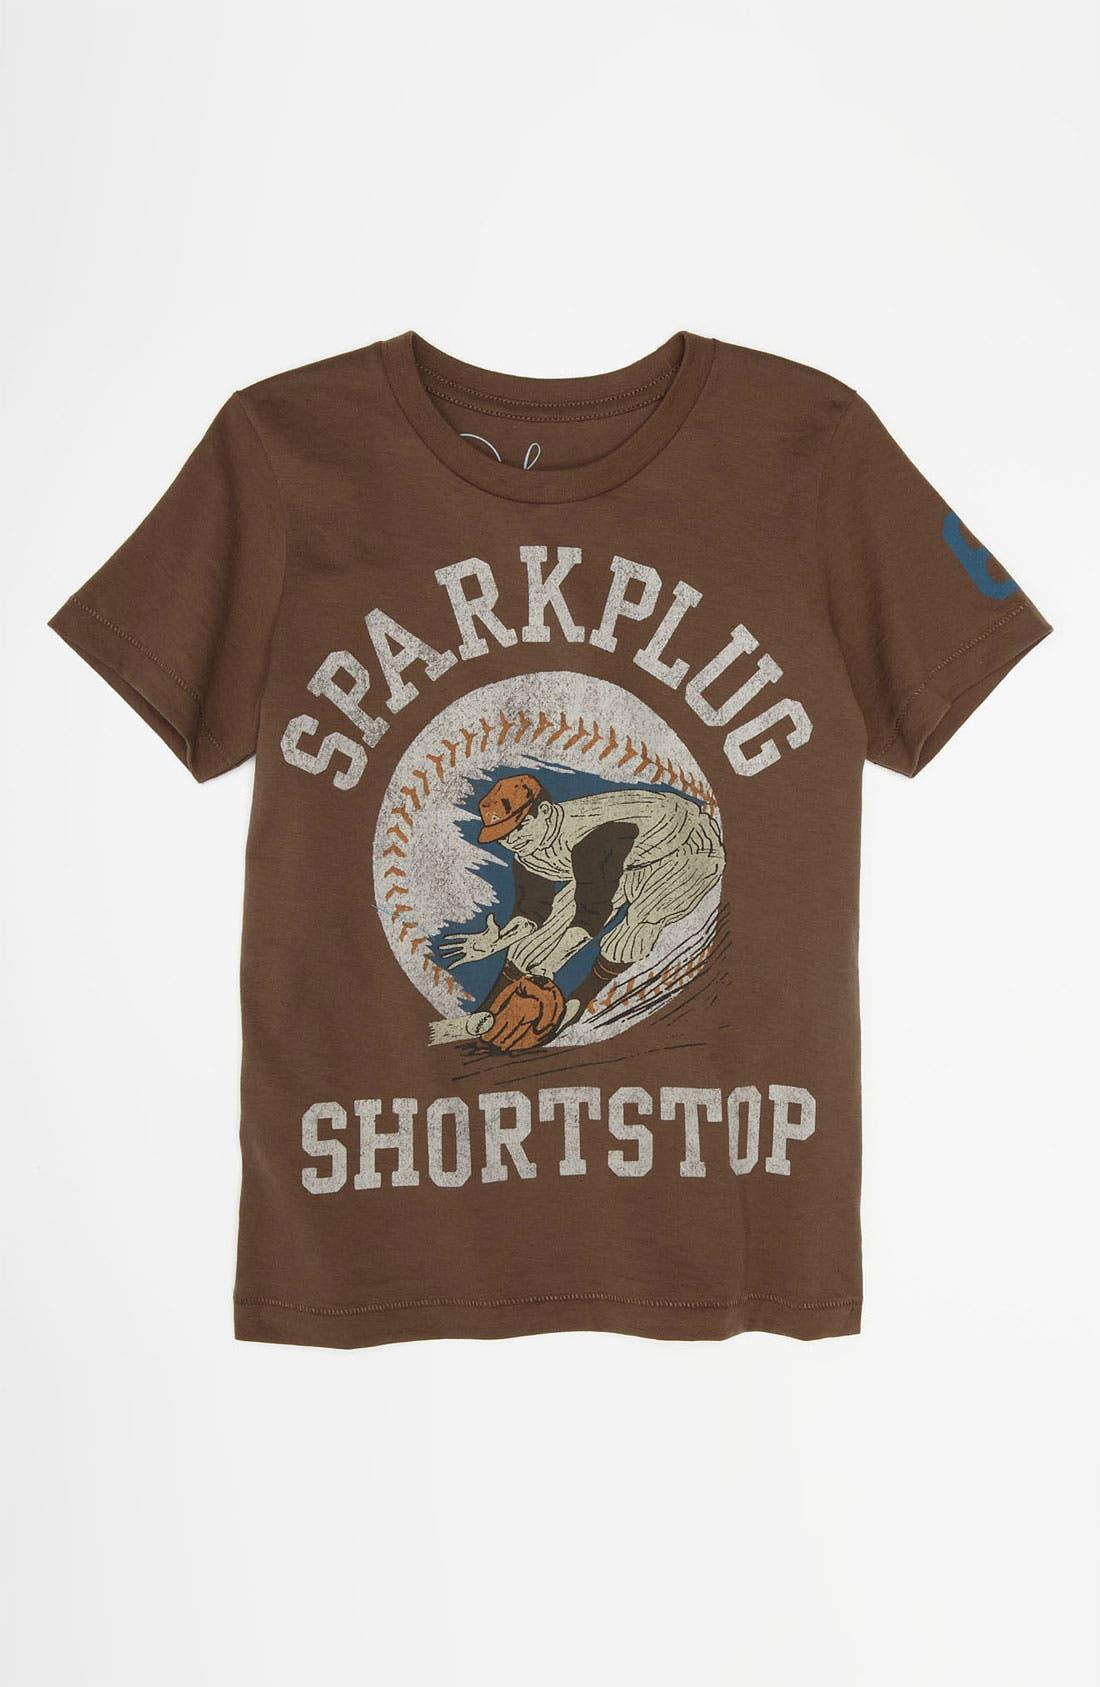 Alternate Image 1 Selected - Peek 'Shortstop' T-Shirt (Toddler, Little Boys & Big Boys)